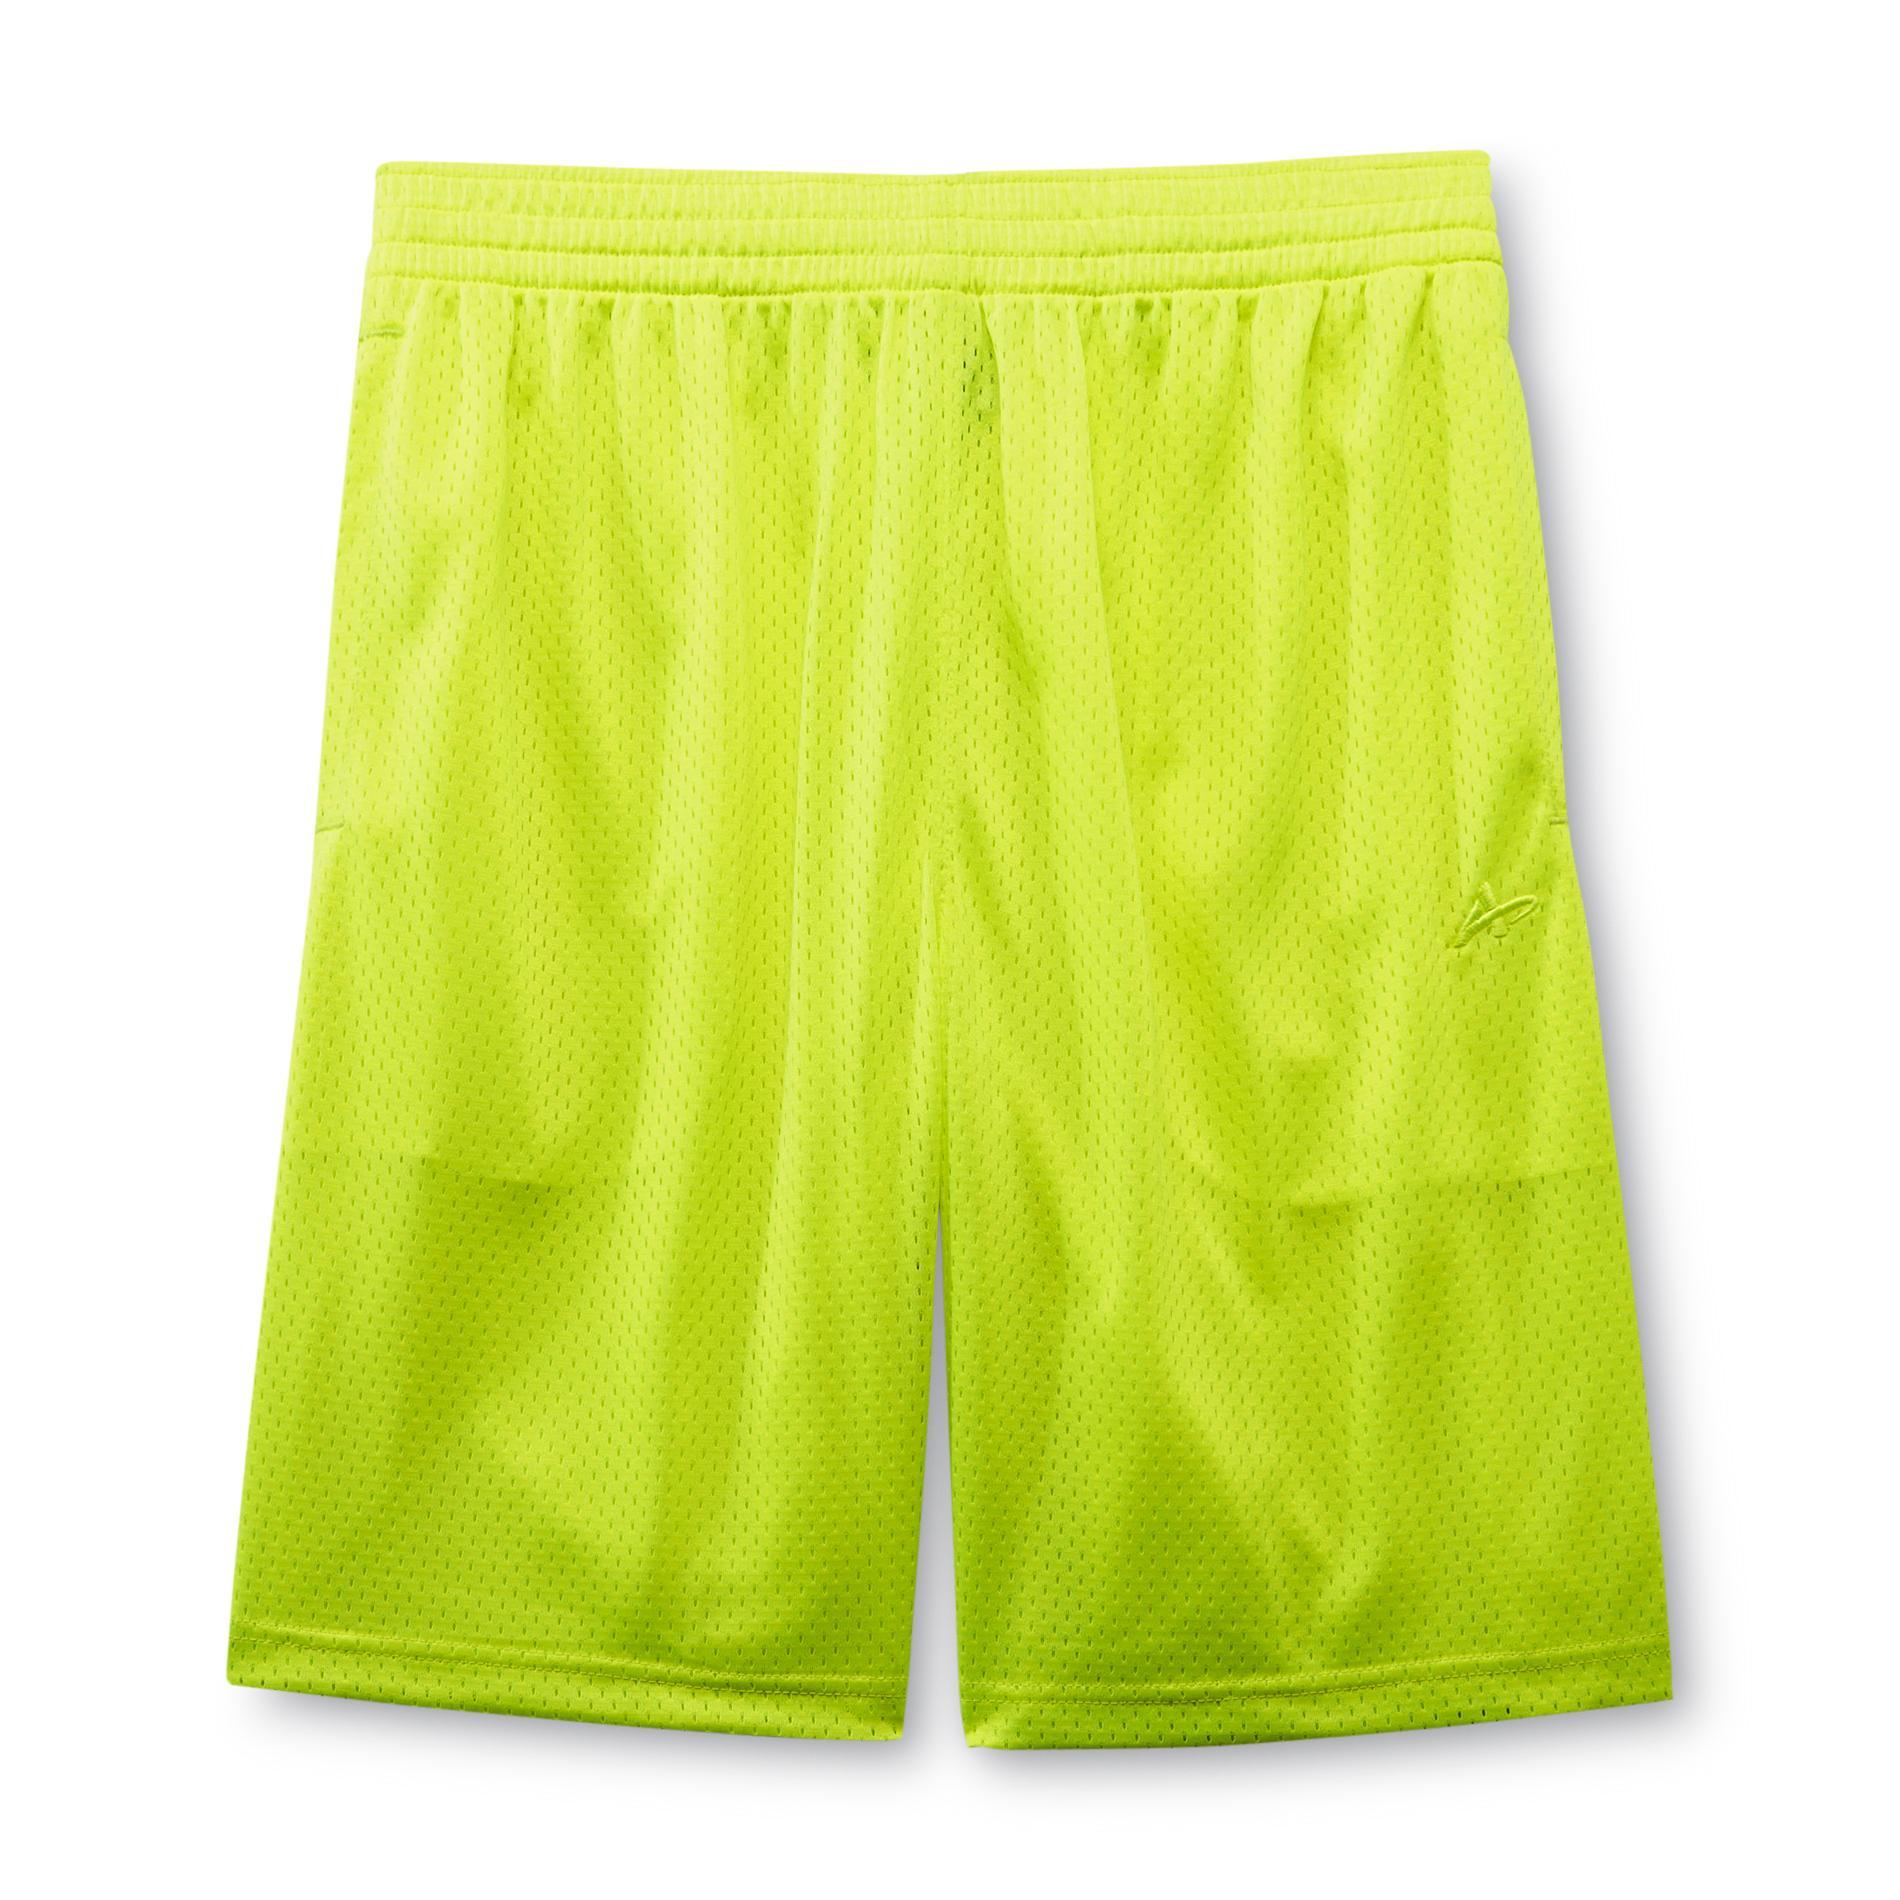 Athletech Men's Mesh Basketball Shorts at Kmart.com